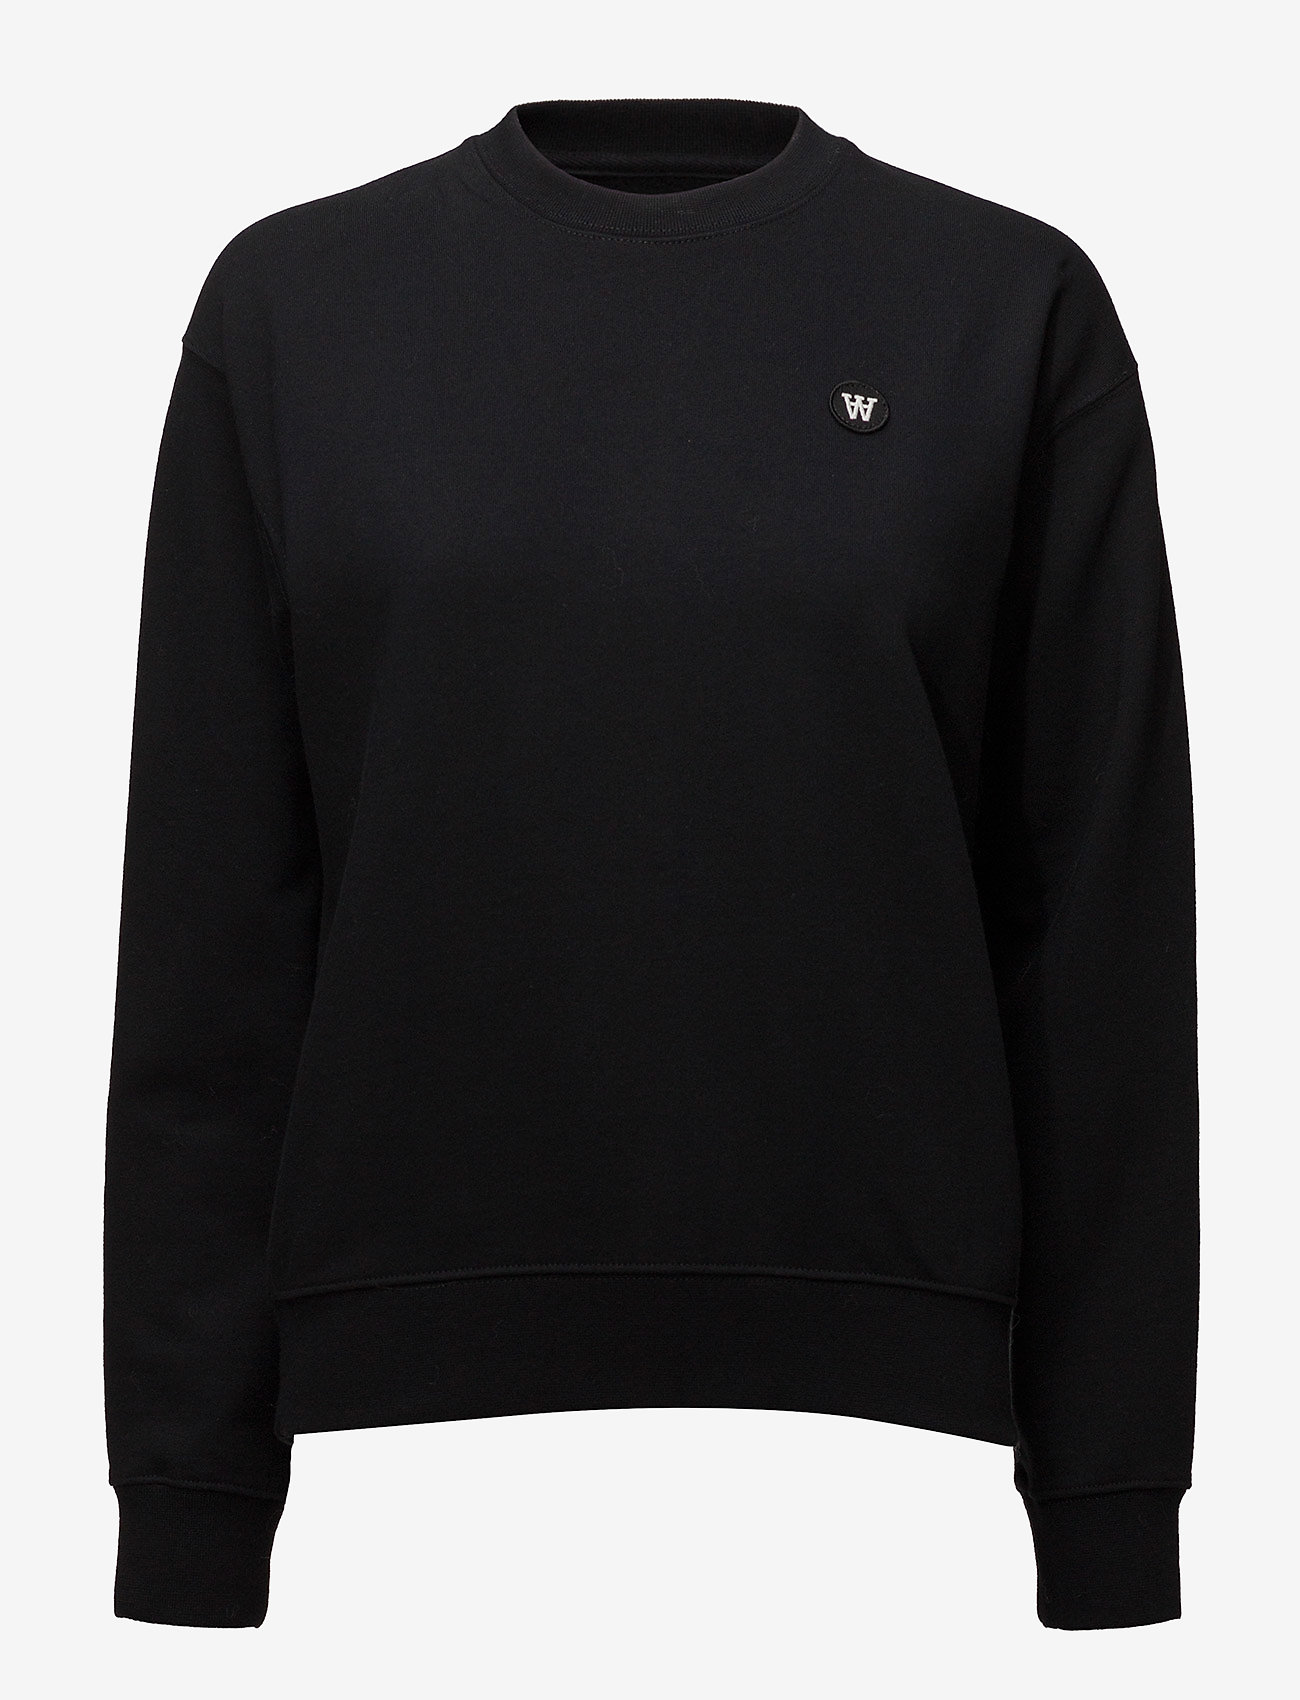 Wood Wood - Jess sweatshirt - sweatshirts - black - 0